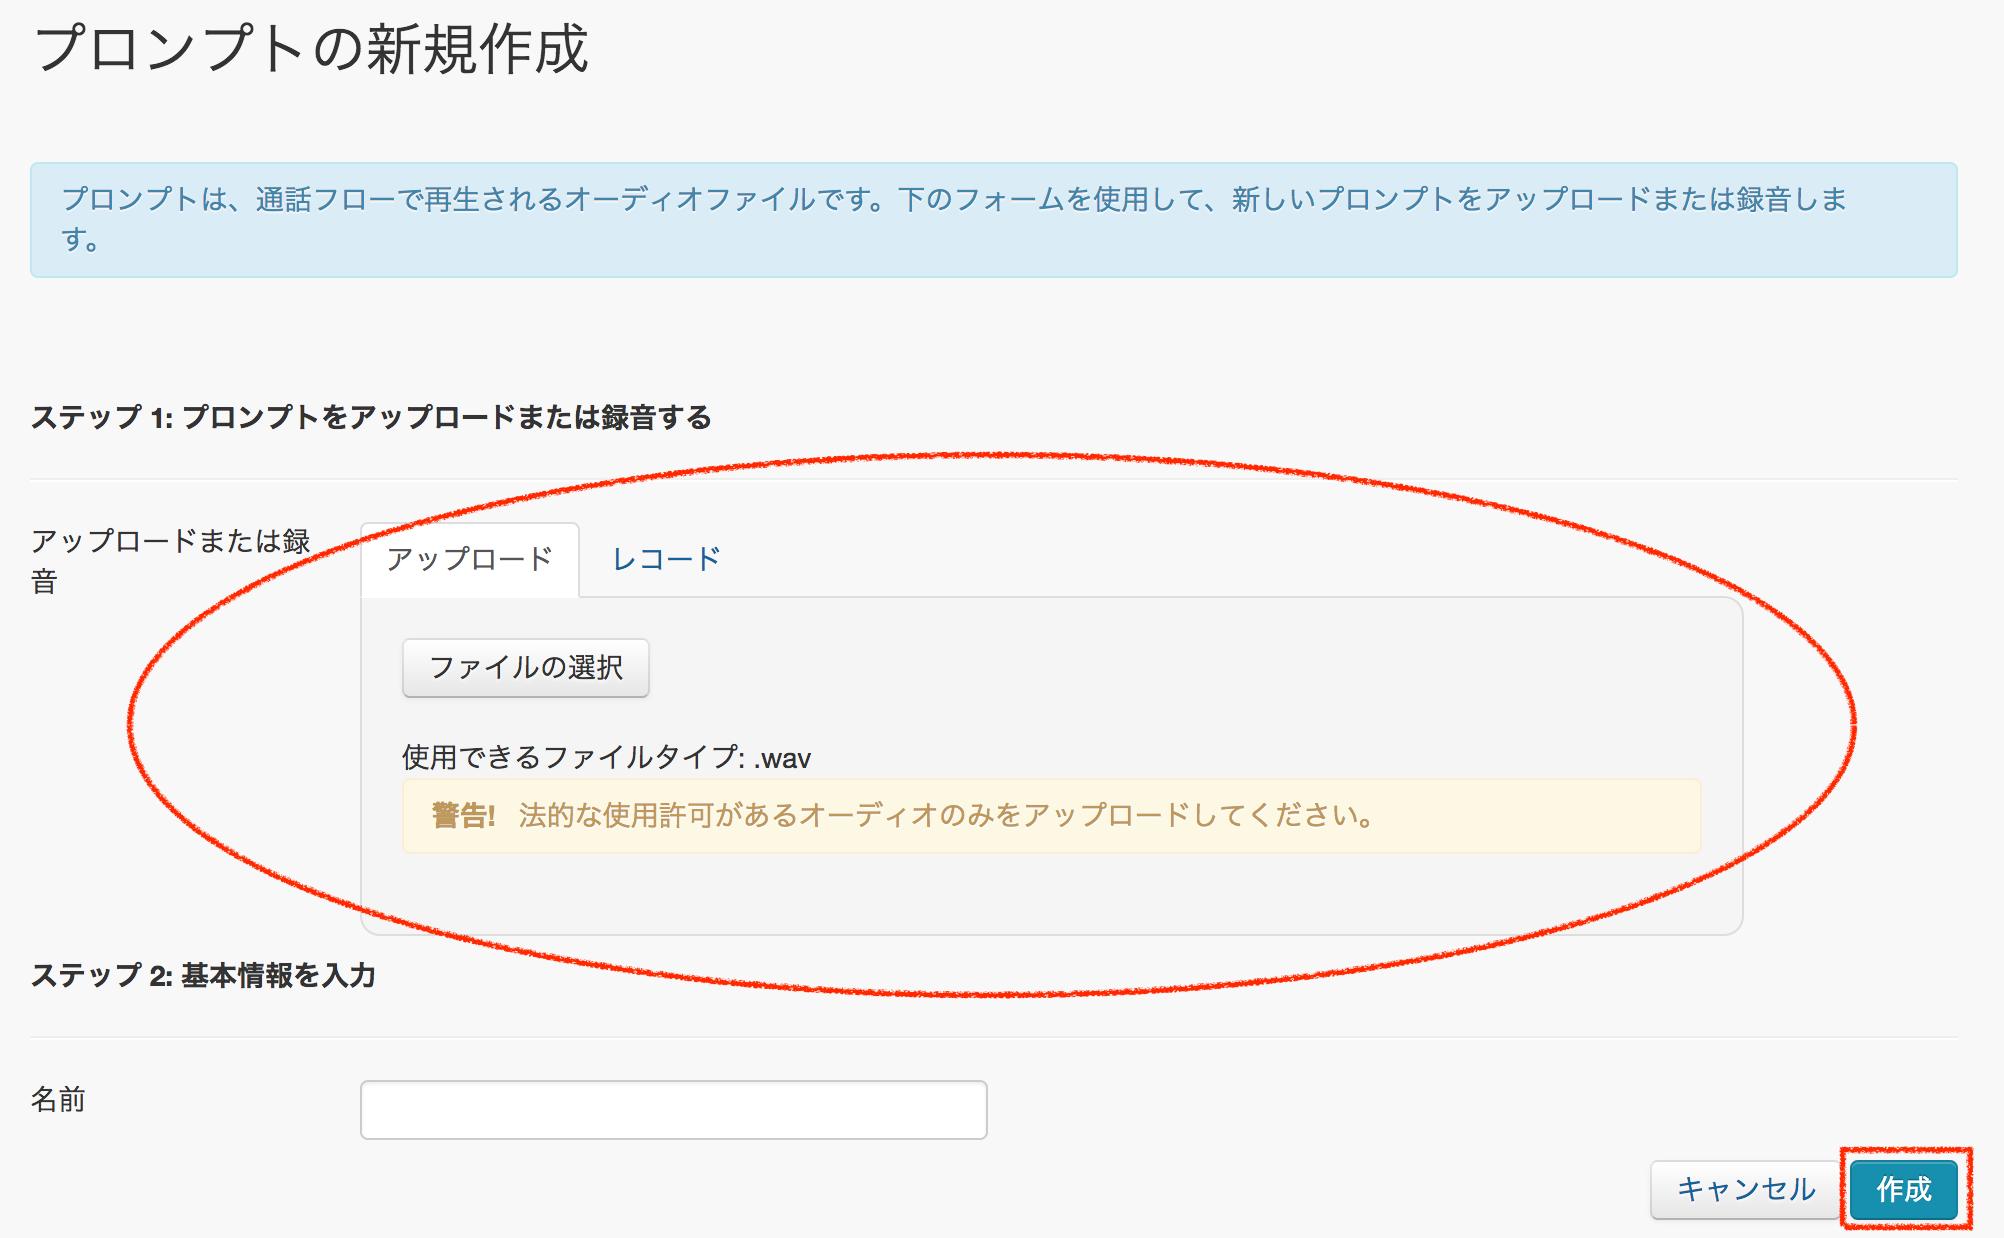 screencapture-kooooohei-awsapps-connect-prompts-create-1517241066926.png